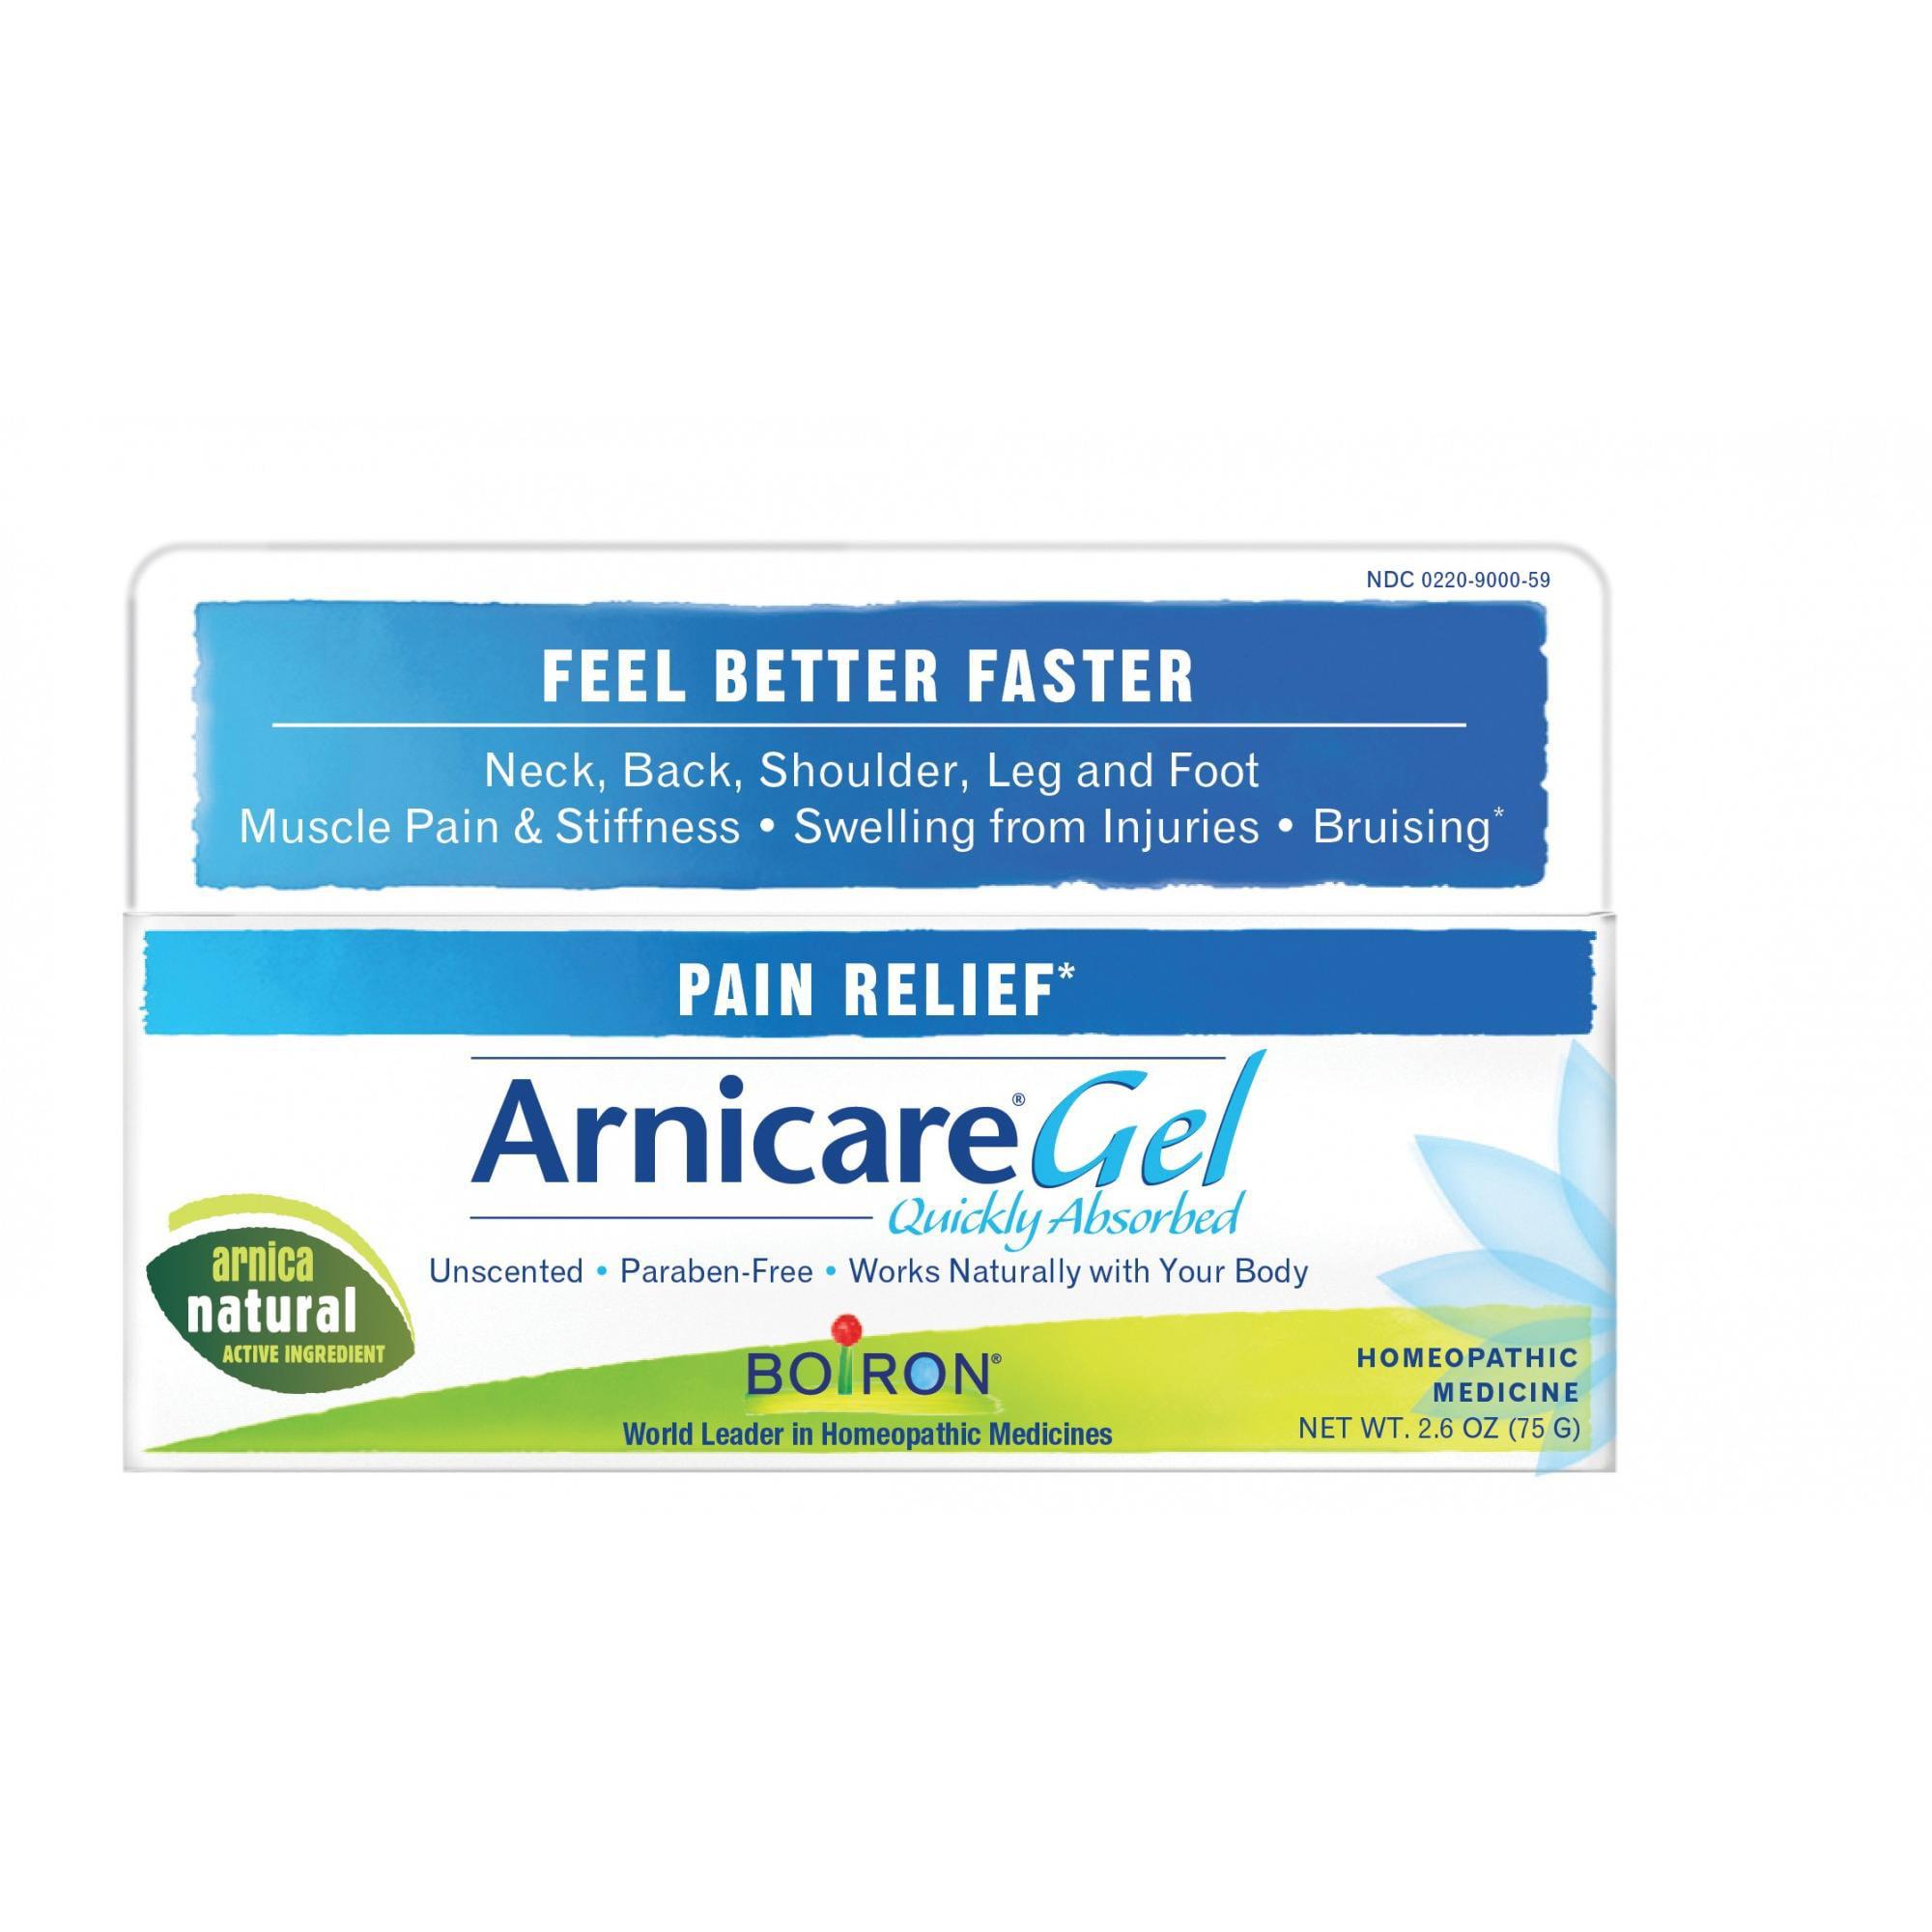 Boiron Arnicare Arnica Gel Homeopathic Medicine, 2.6 oz